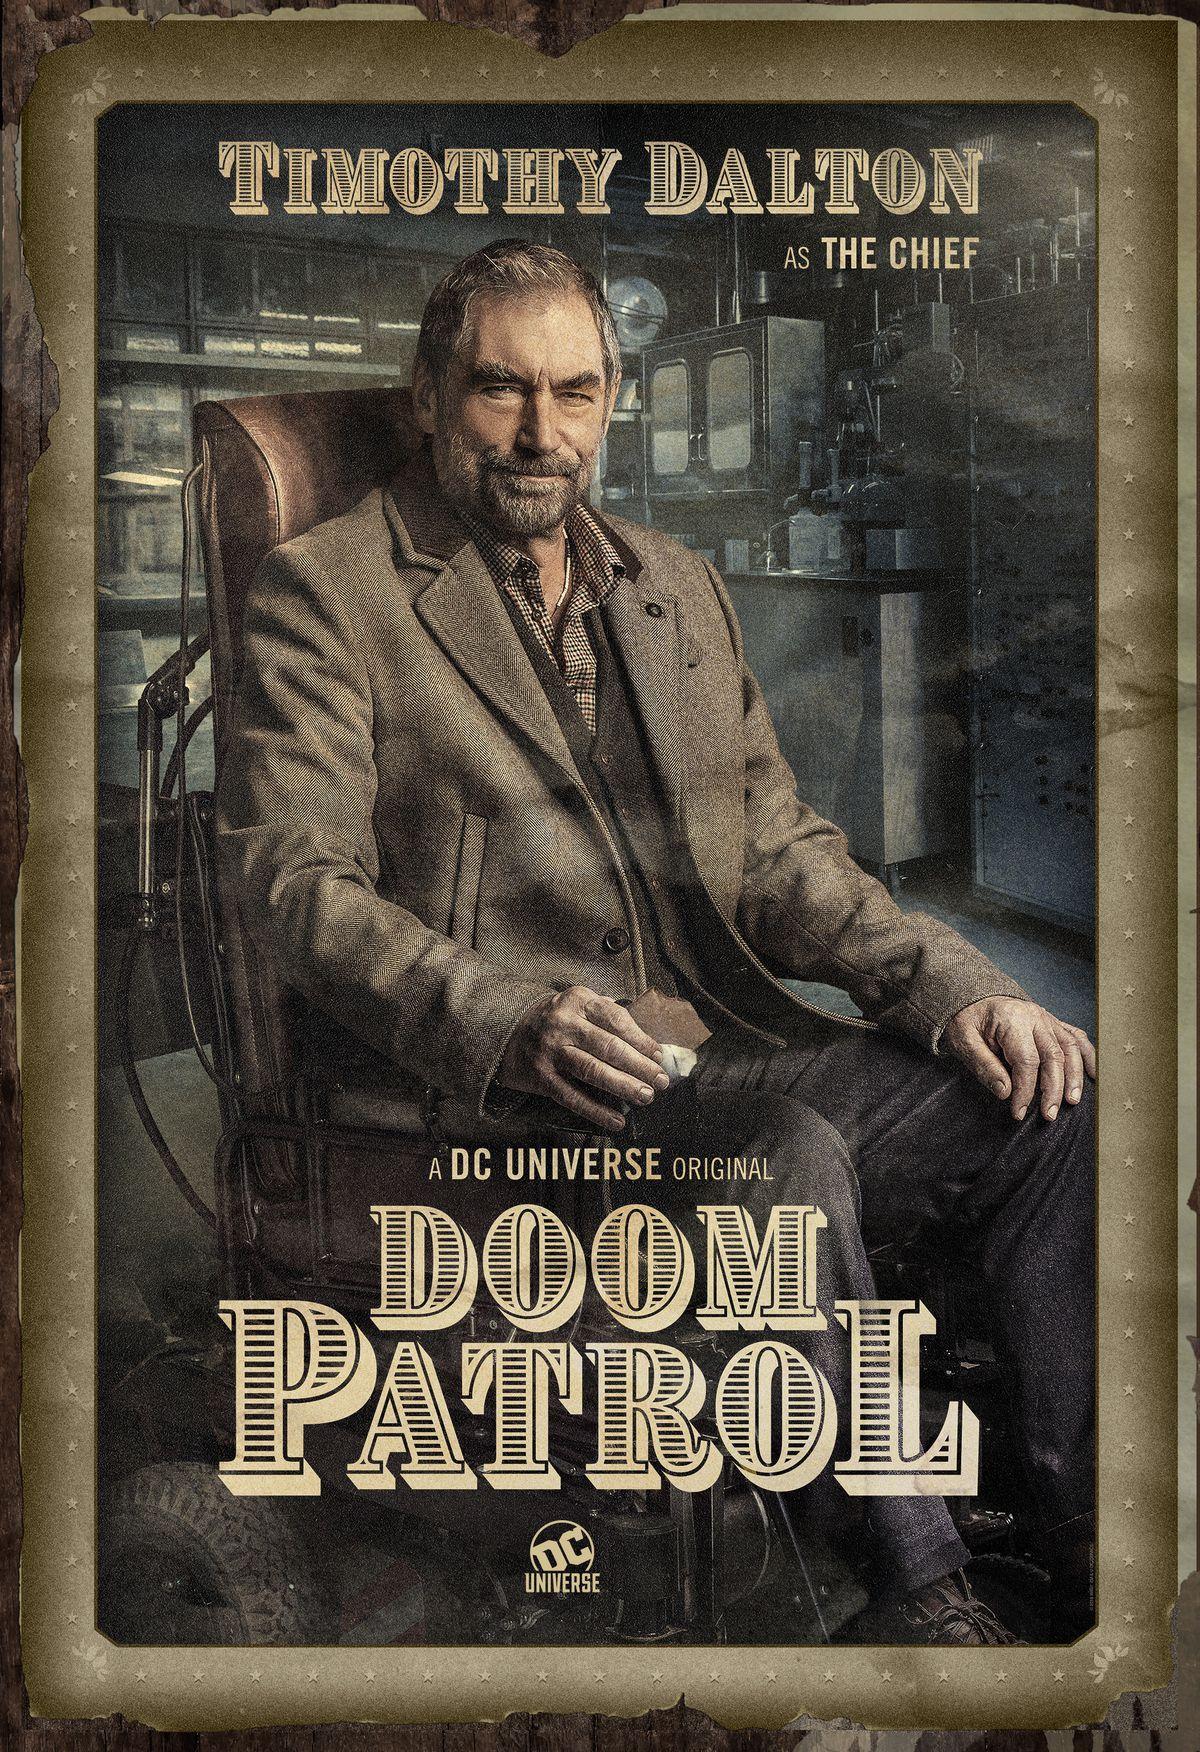 Timothy Dalton as the wheelchair-using Chief of the Doom Patrol.